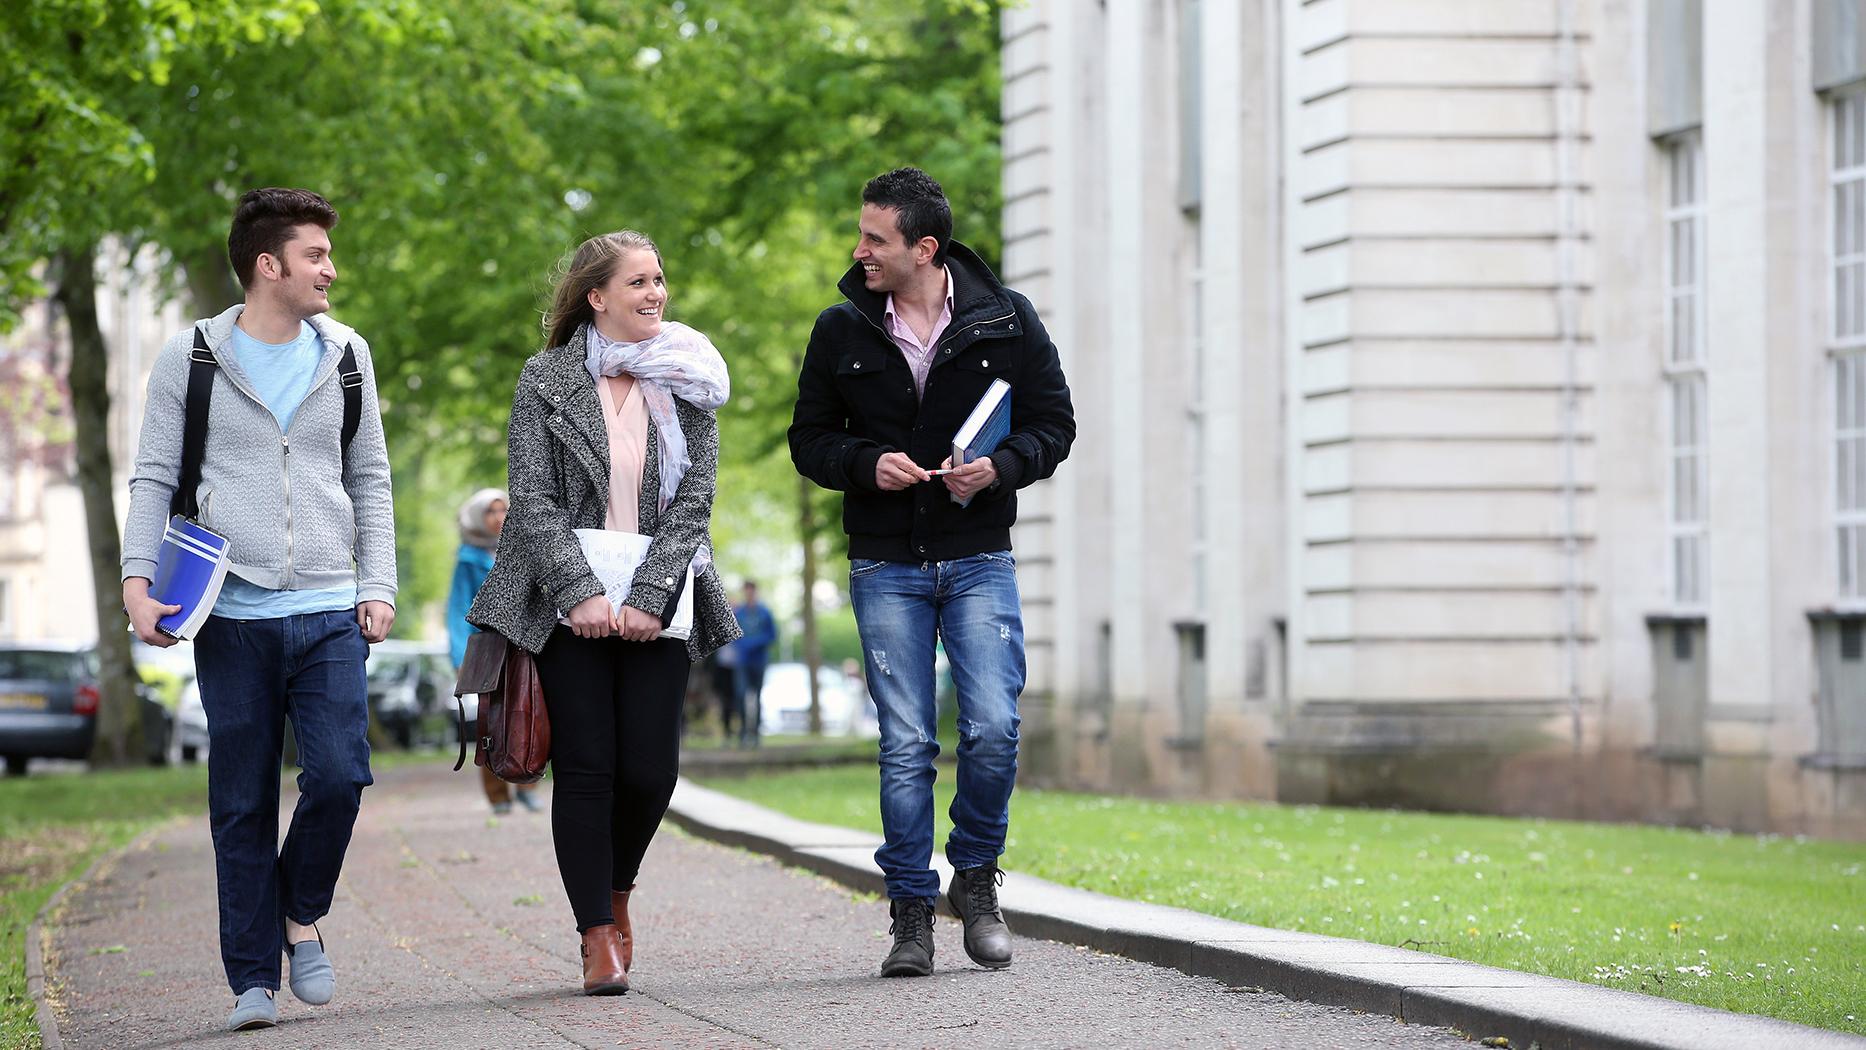 Encryption – Information Security - Cardiff University